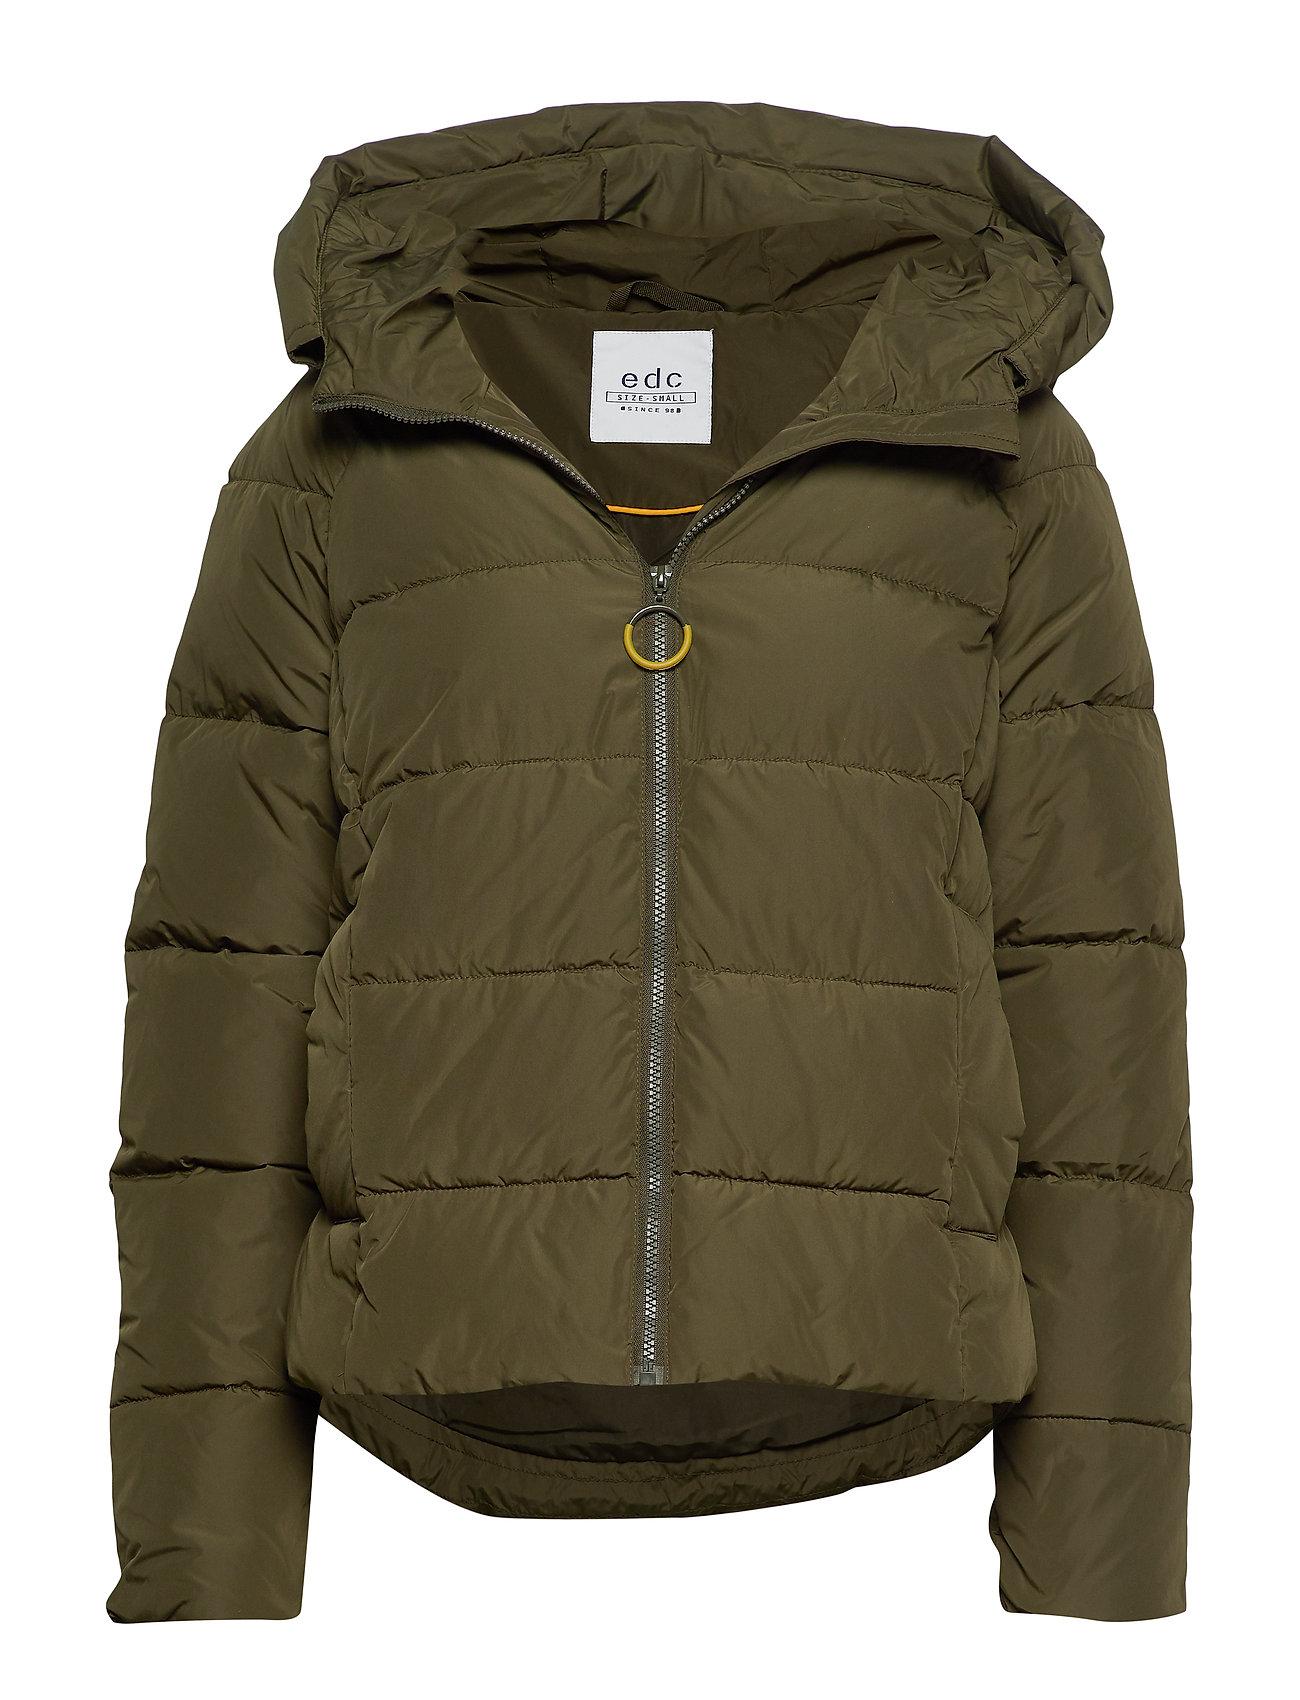 Jackets By Outdoor GreenEdc Esprit Wovenkhaki qzMVpSjLUG